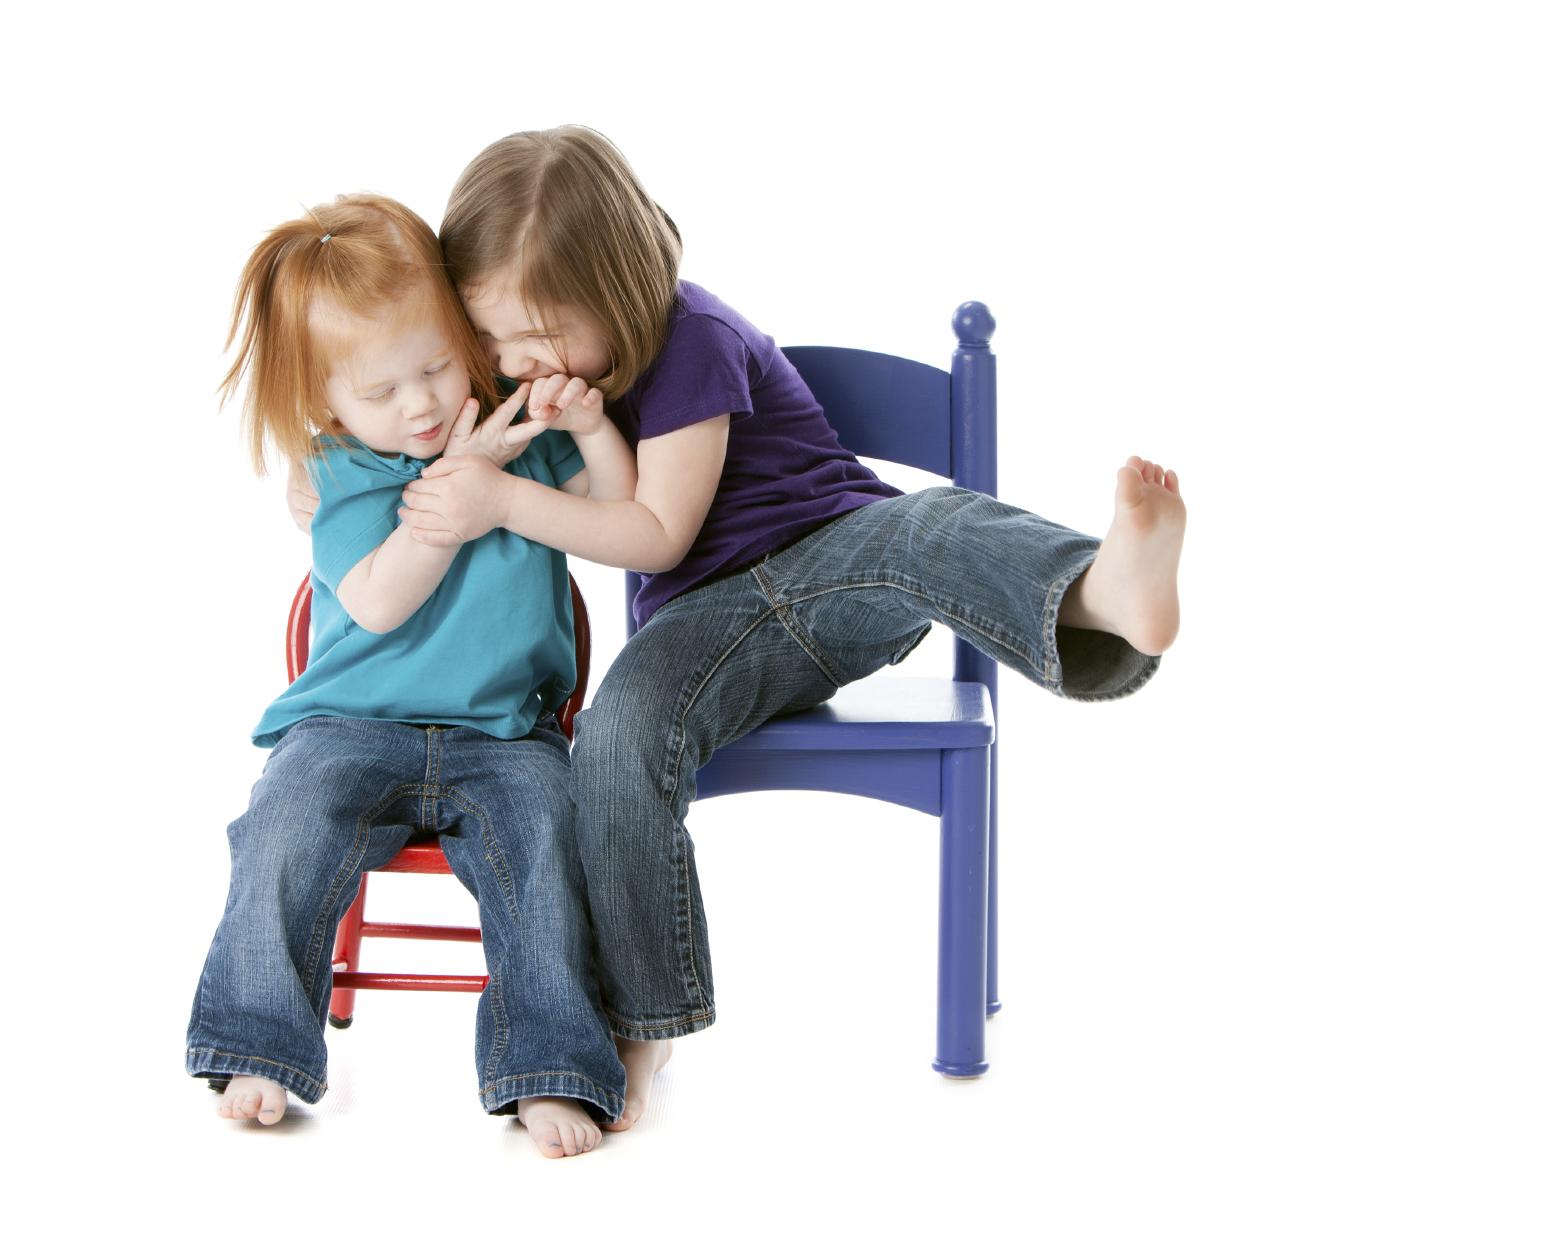 Teaching Kids To Share